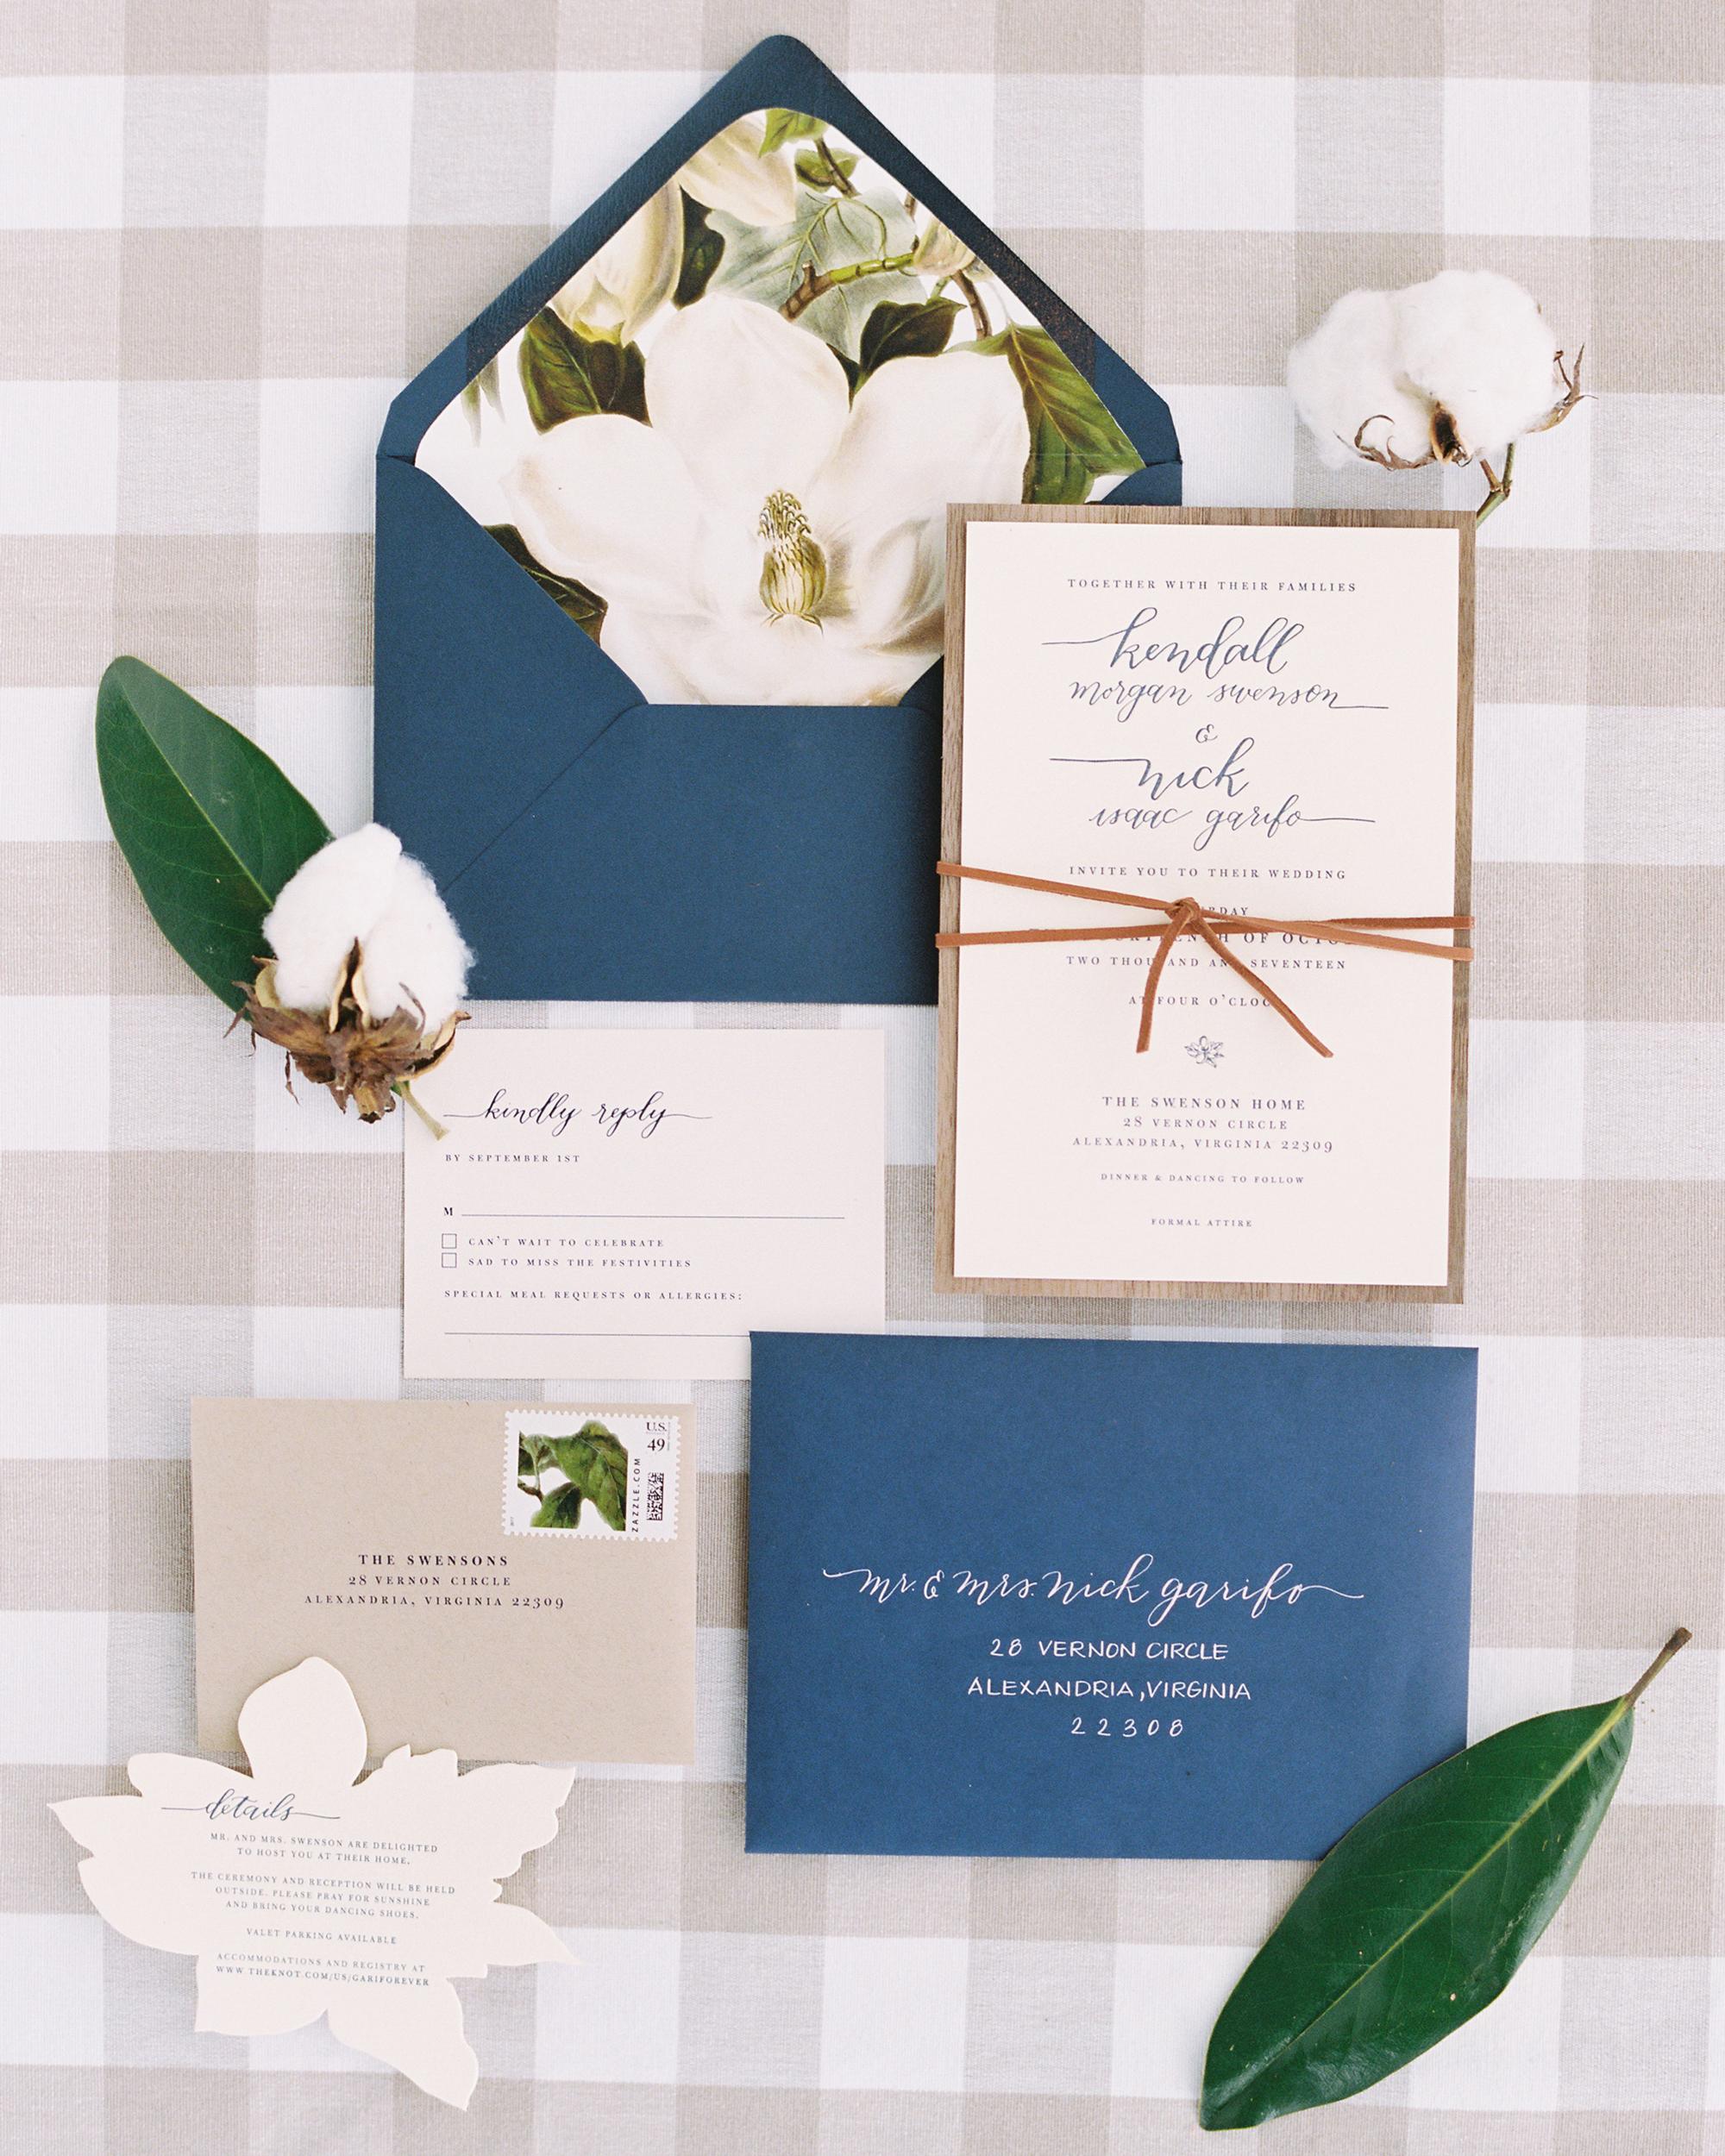 kendall nick wedding invitation